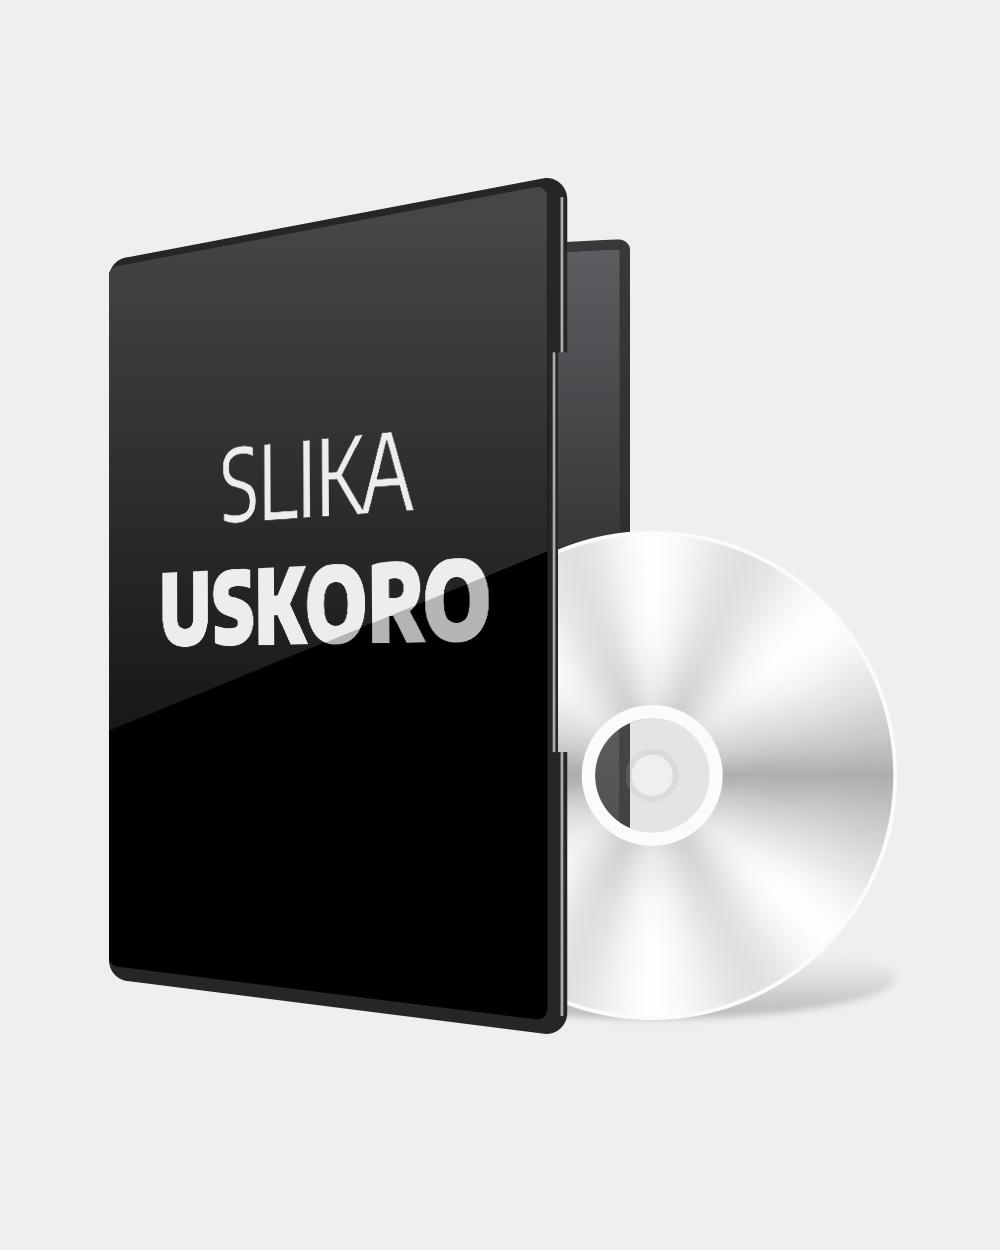 PCG LEGO Hobbit